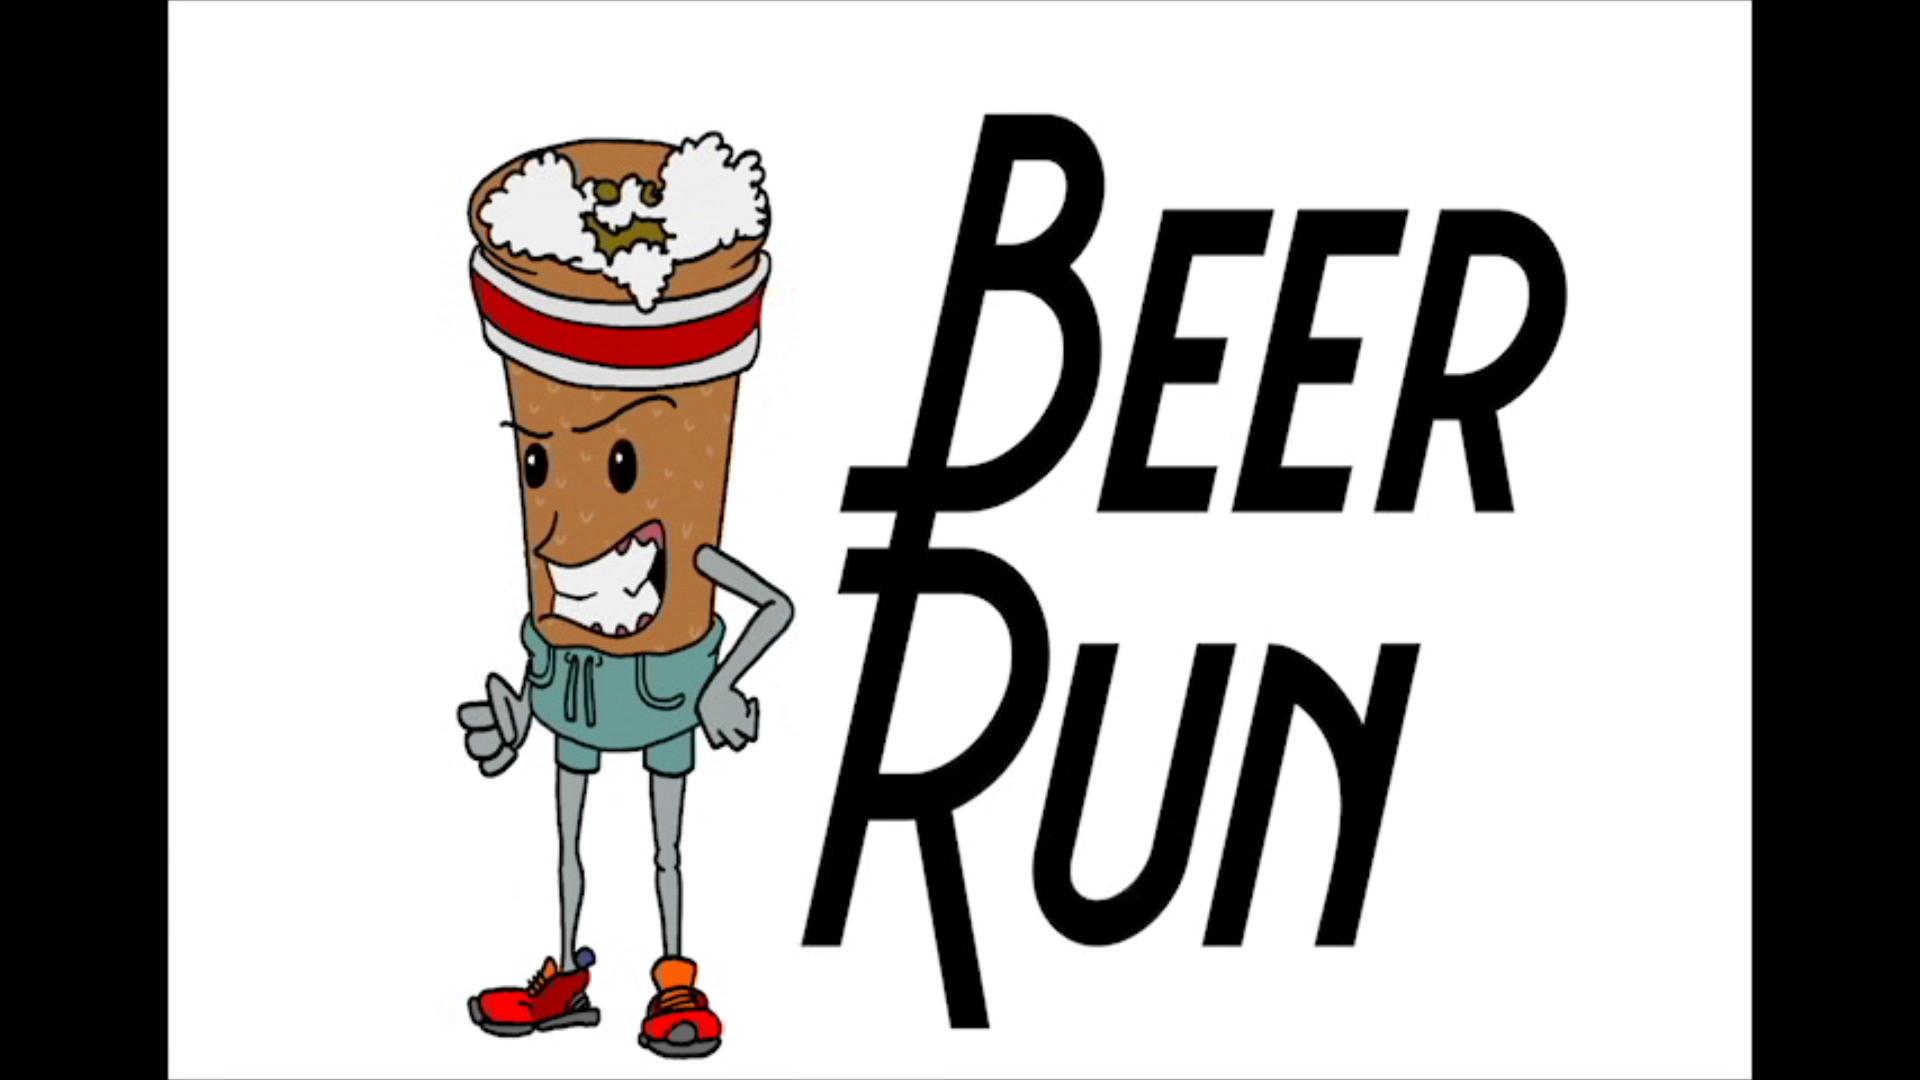 Beer Run Poster0.jpg